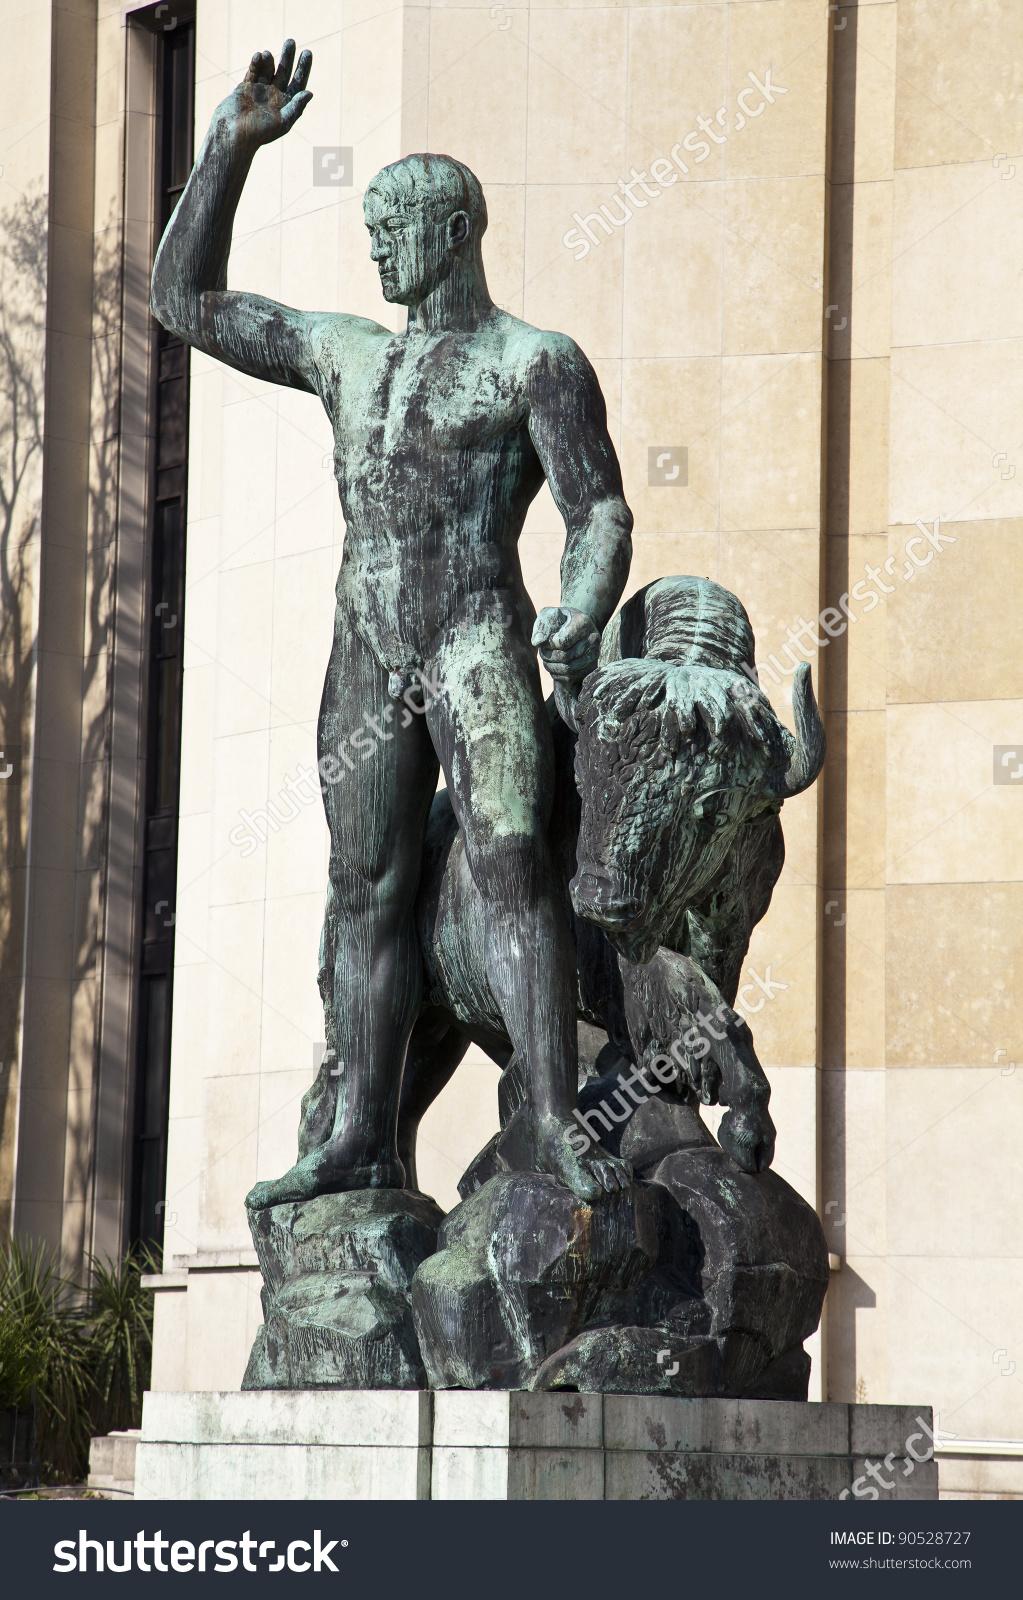 Sculpture Of (Hercules) Heracles At Trocadero (Palais De Chaillot.